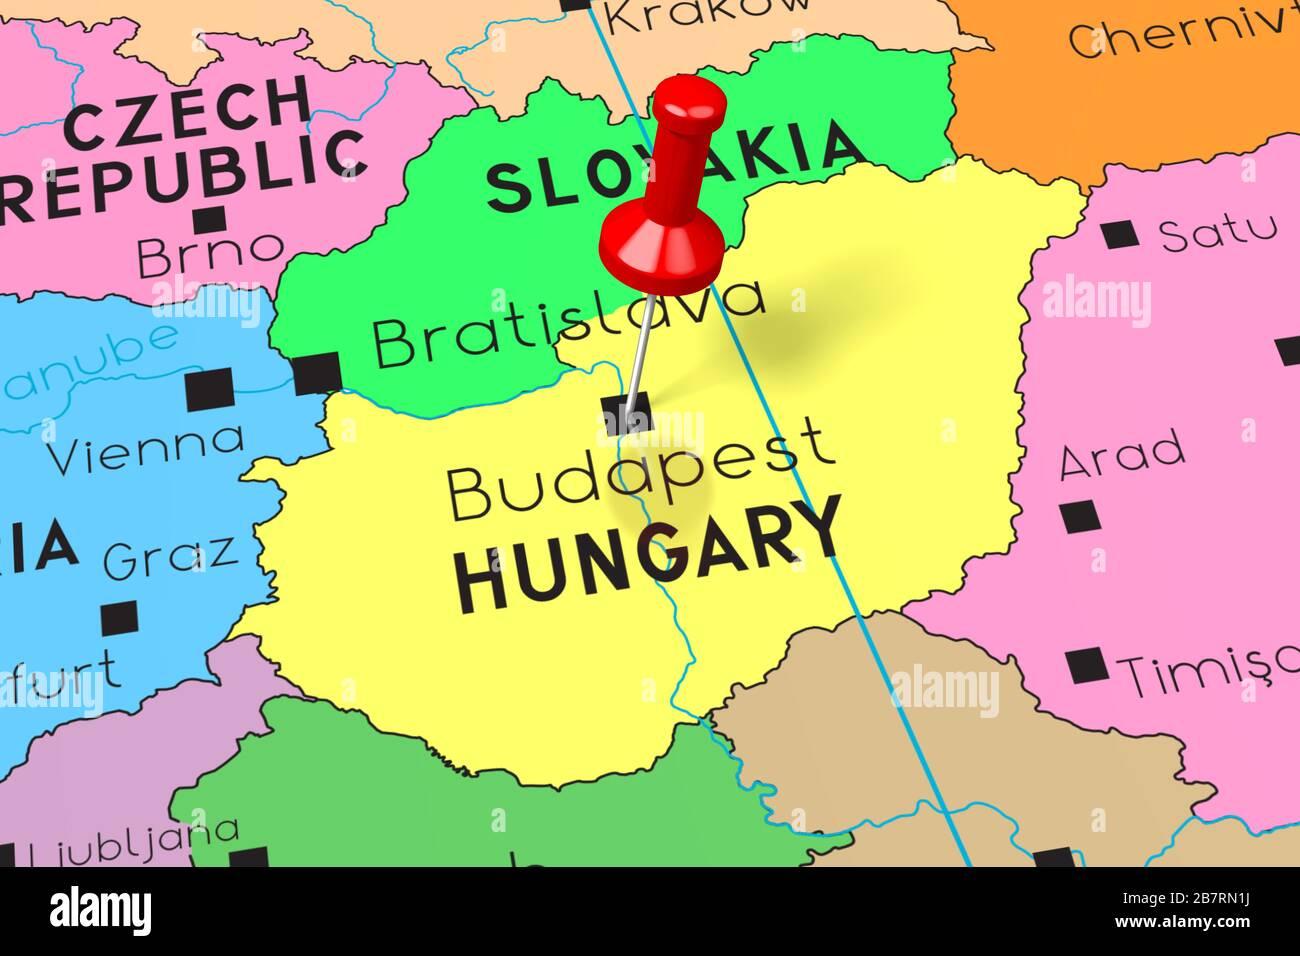 Image of: Hungary Budapest Capital City Pinned On Political Map Stock Photo Alamy